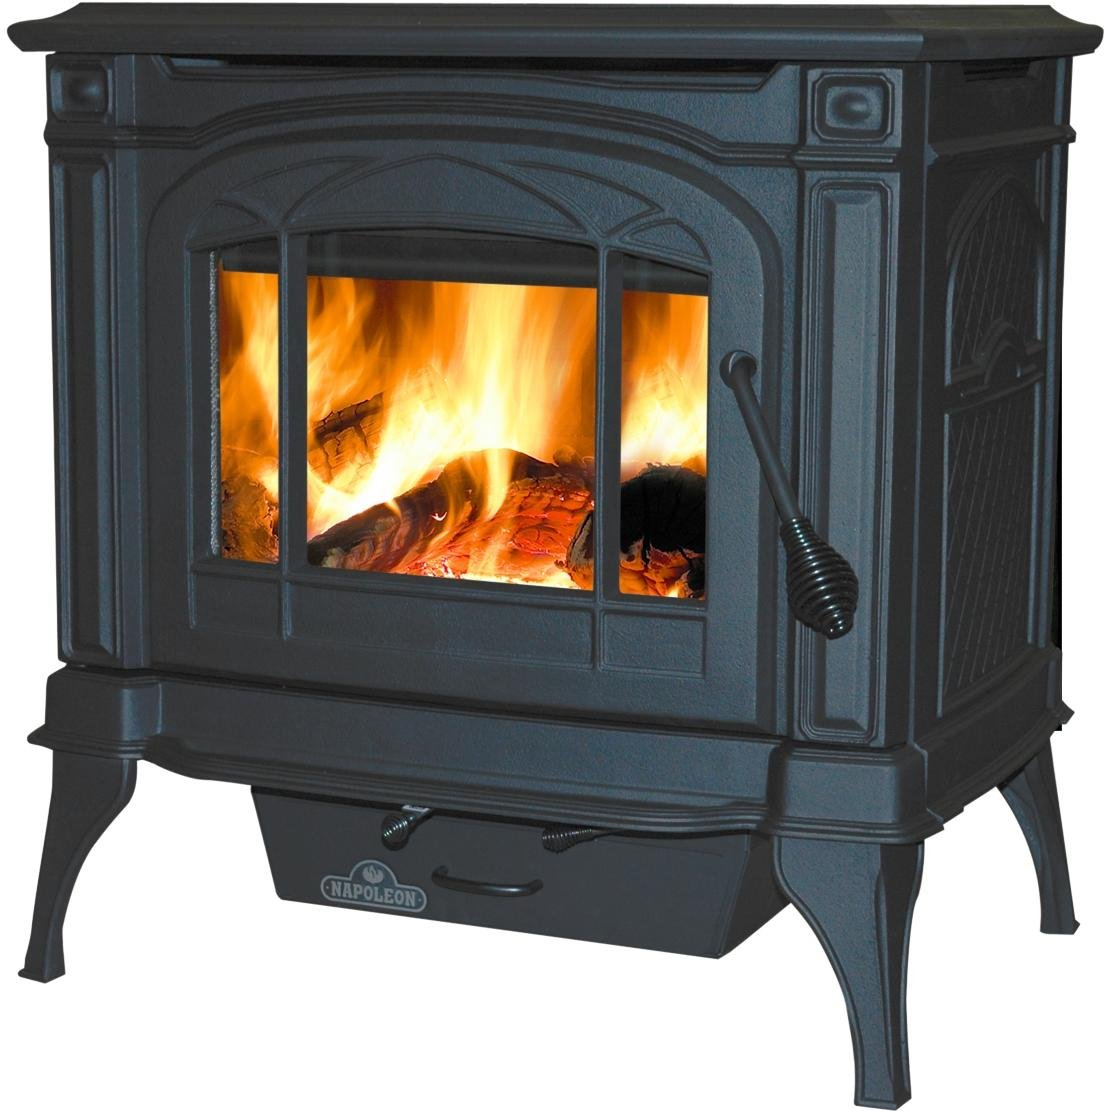 amazon com napoleon 1100c wood burning stove black kitchen